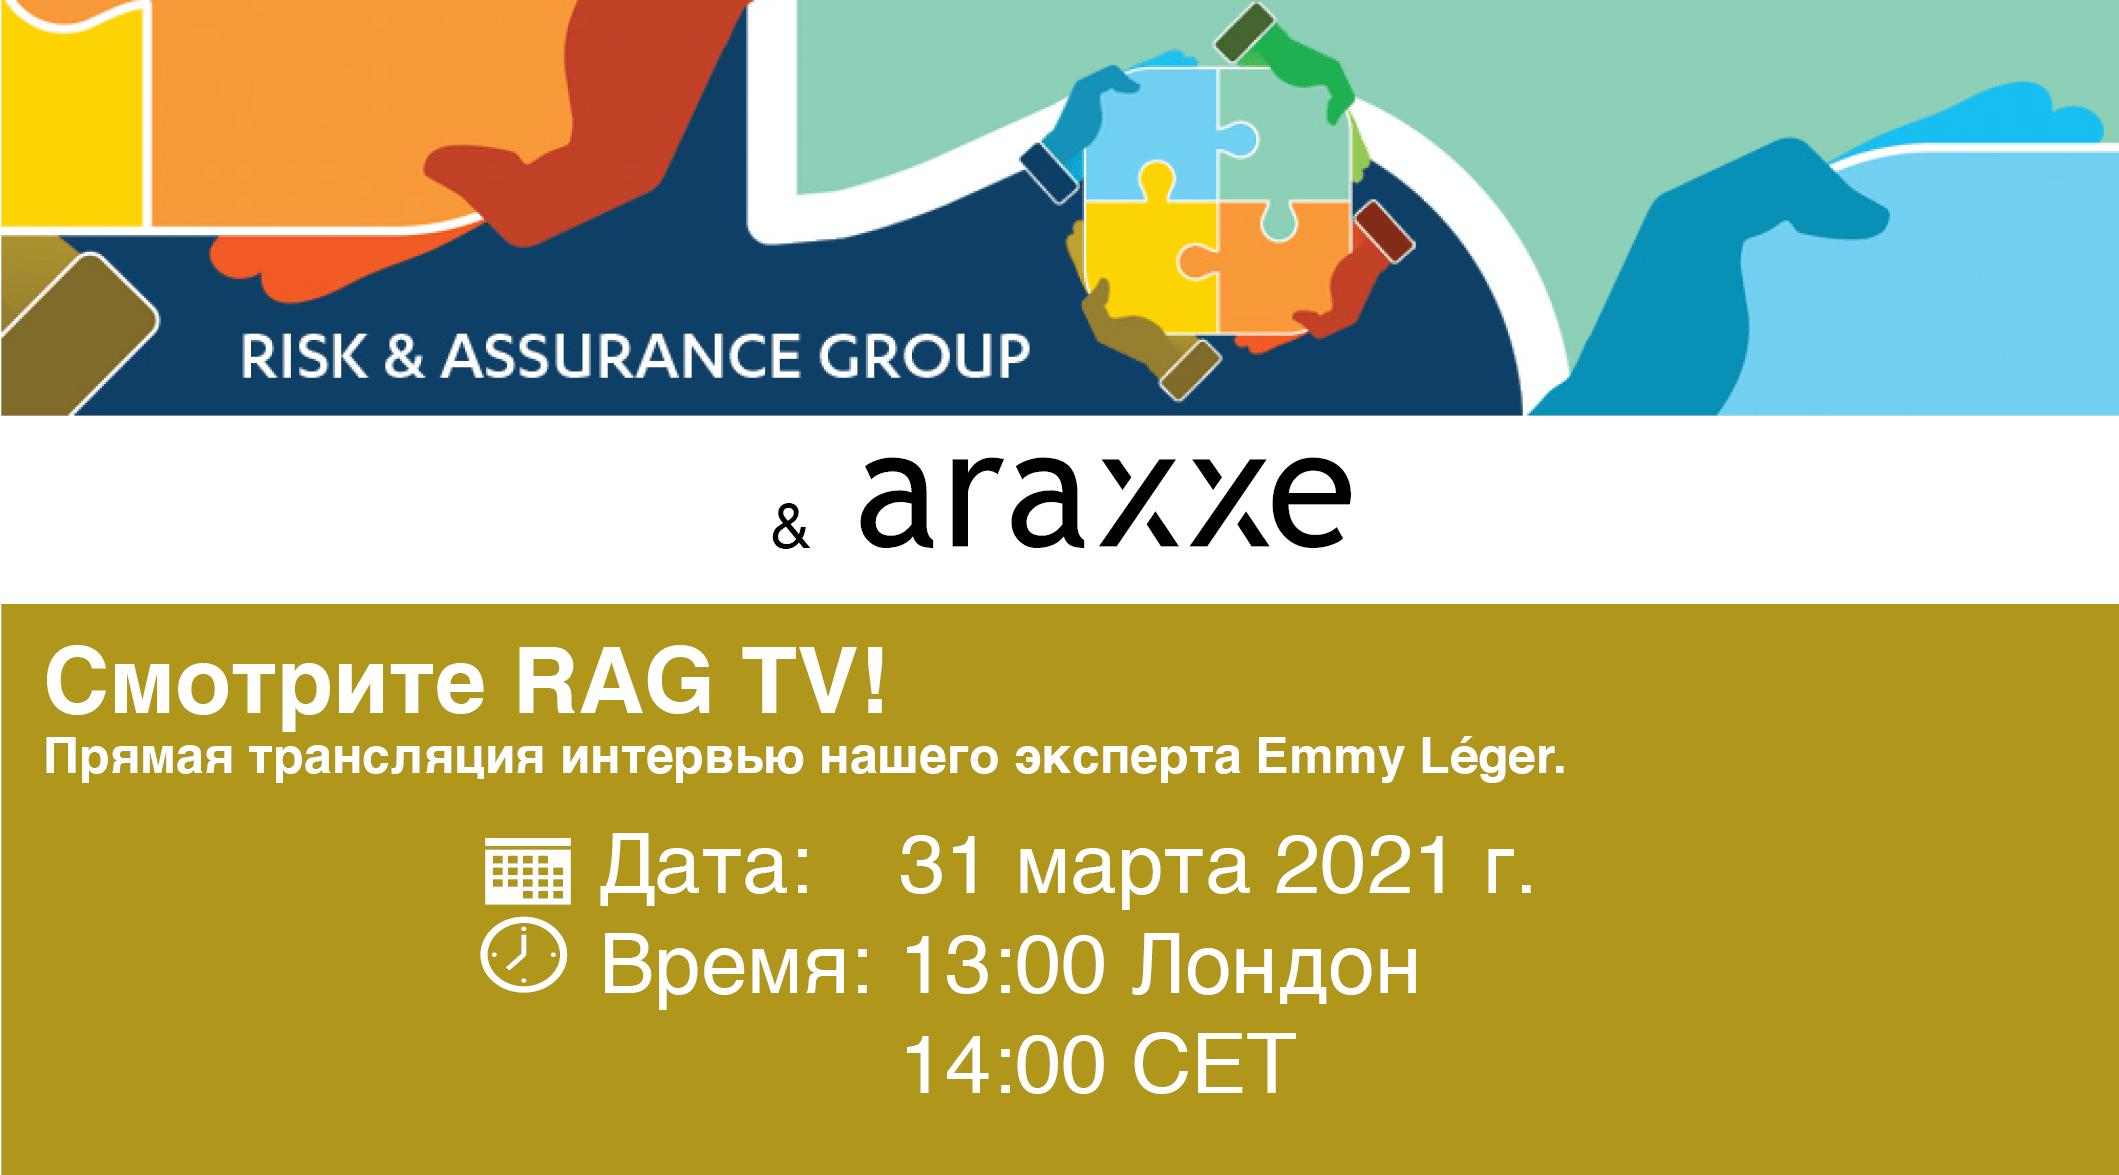 RU_RAG TV March 31st